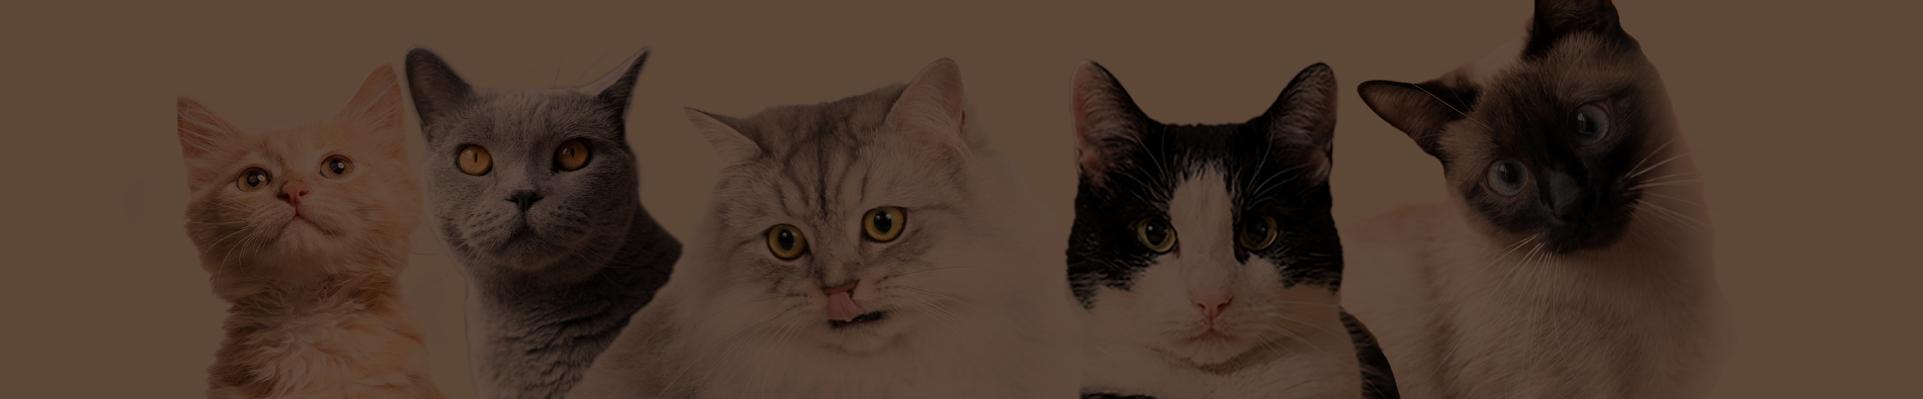 palatability study cats